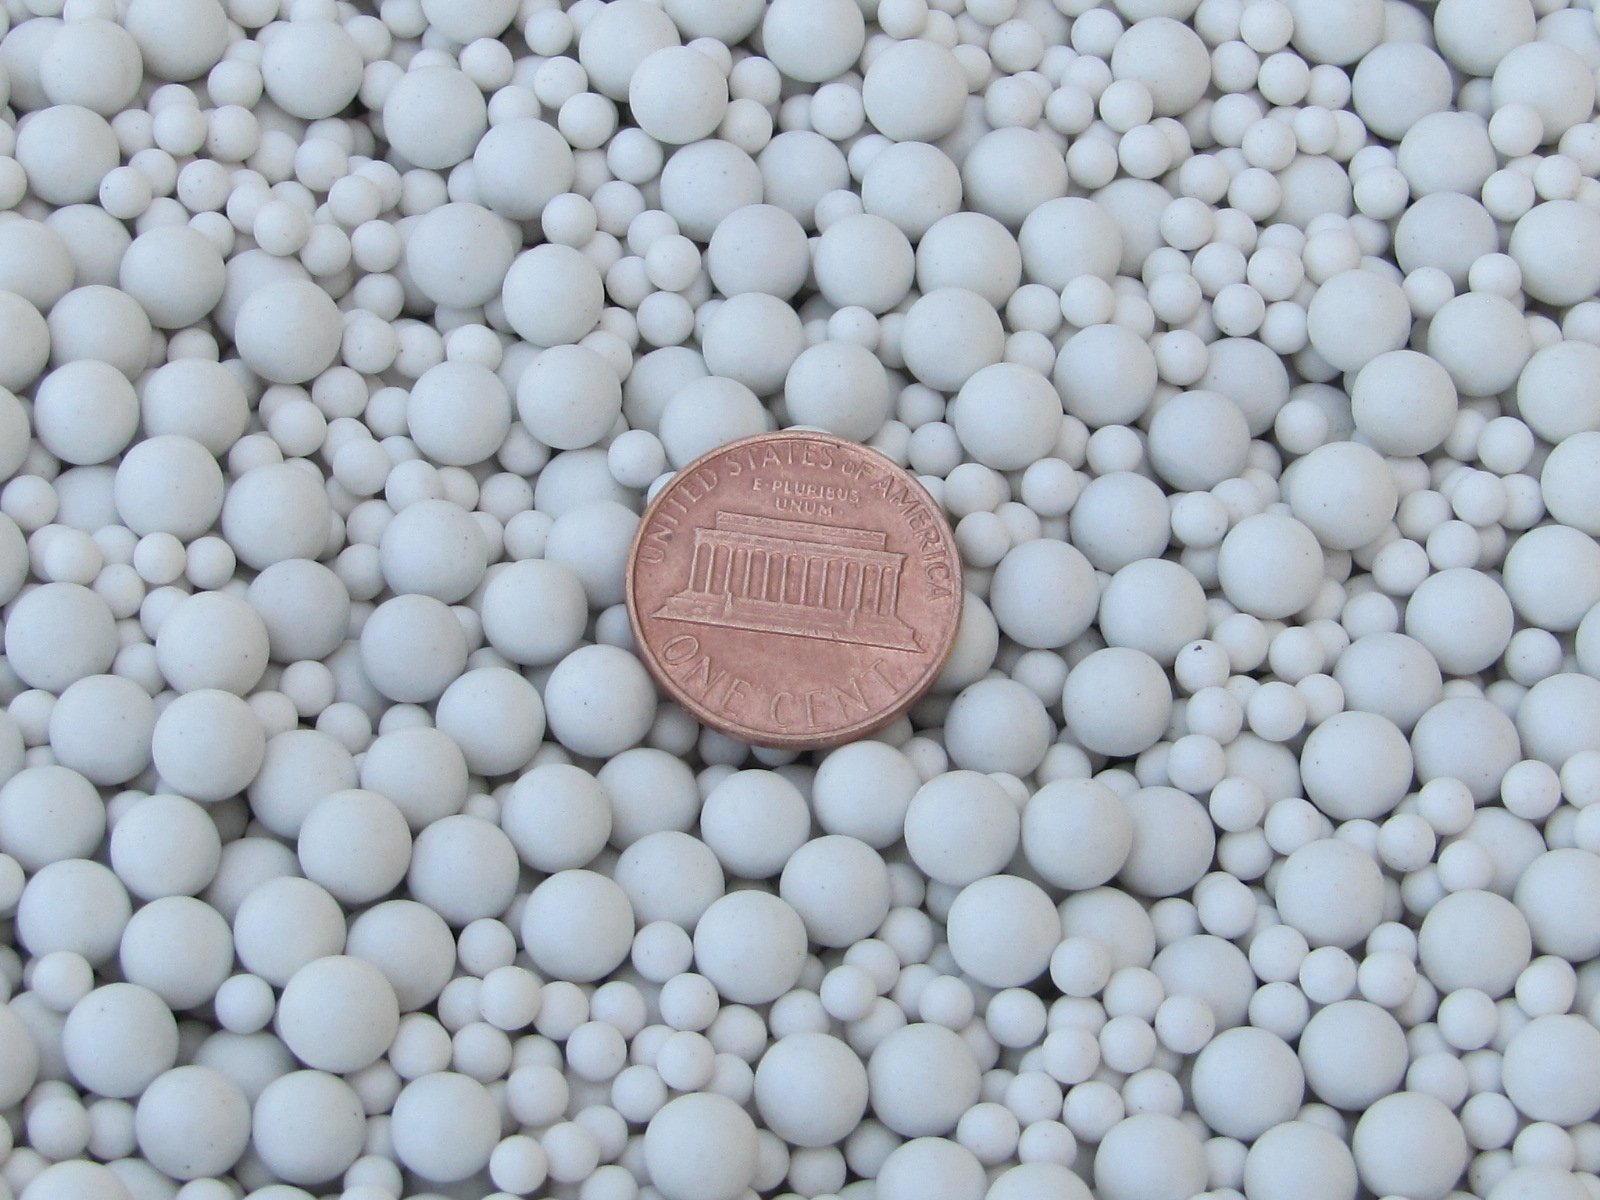 Ceramic Porcelain Tumbling Media Mixed 2 Lbs. 3 mm & 6 mm Polishing Sphere Non-Abrasive